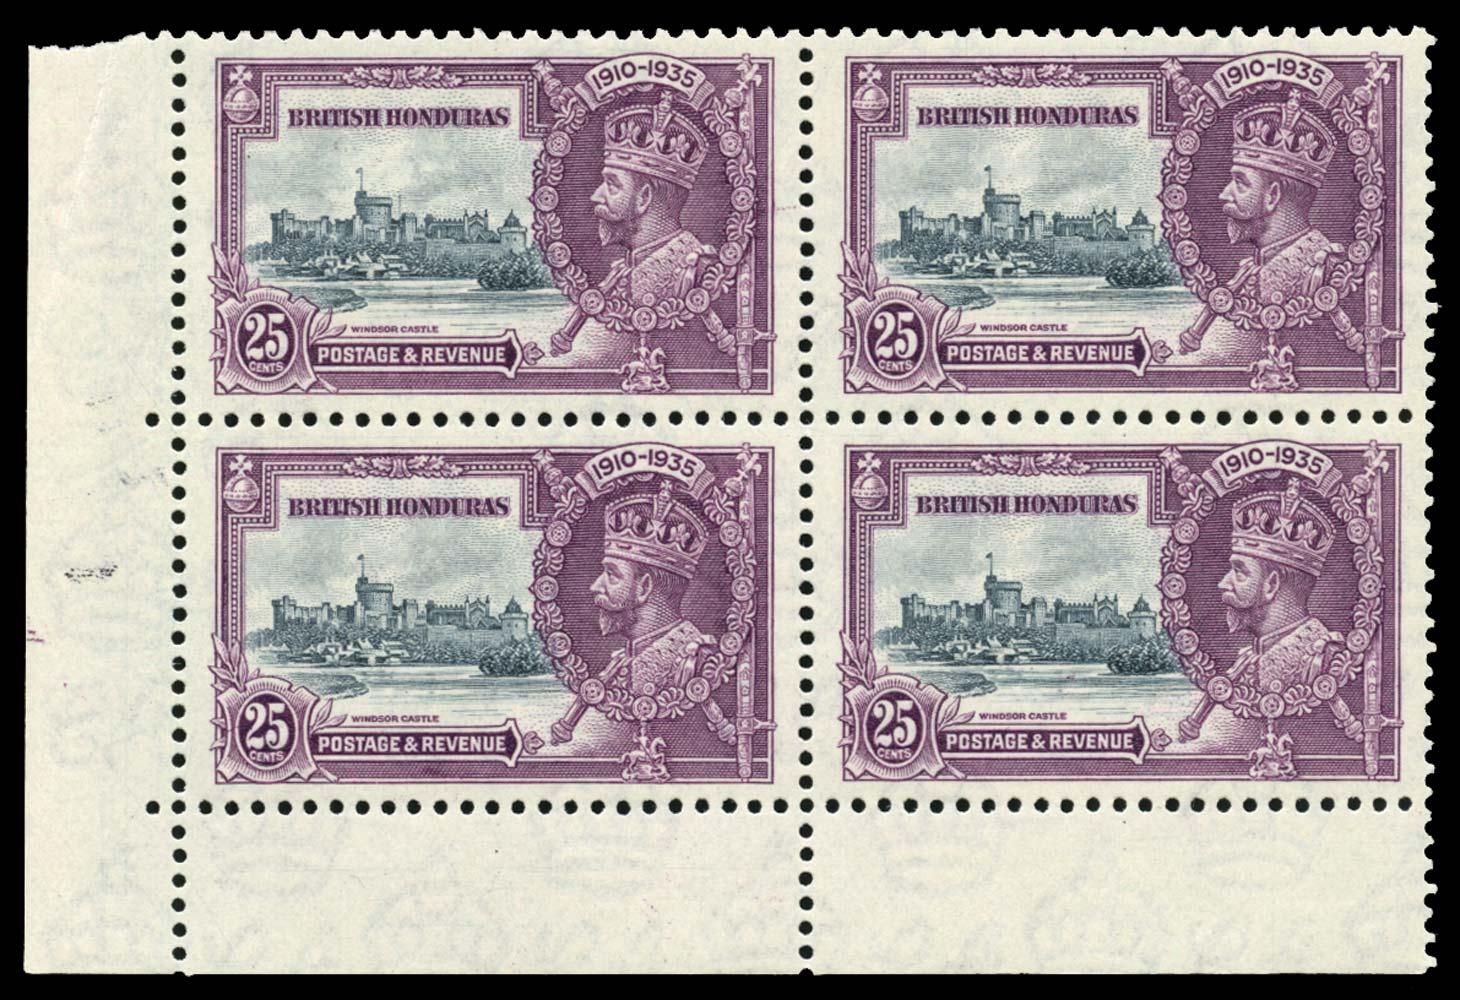 BRITISH HONDURAS 1935  SG146/a Mint Extra Flagstaff